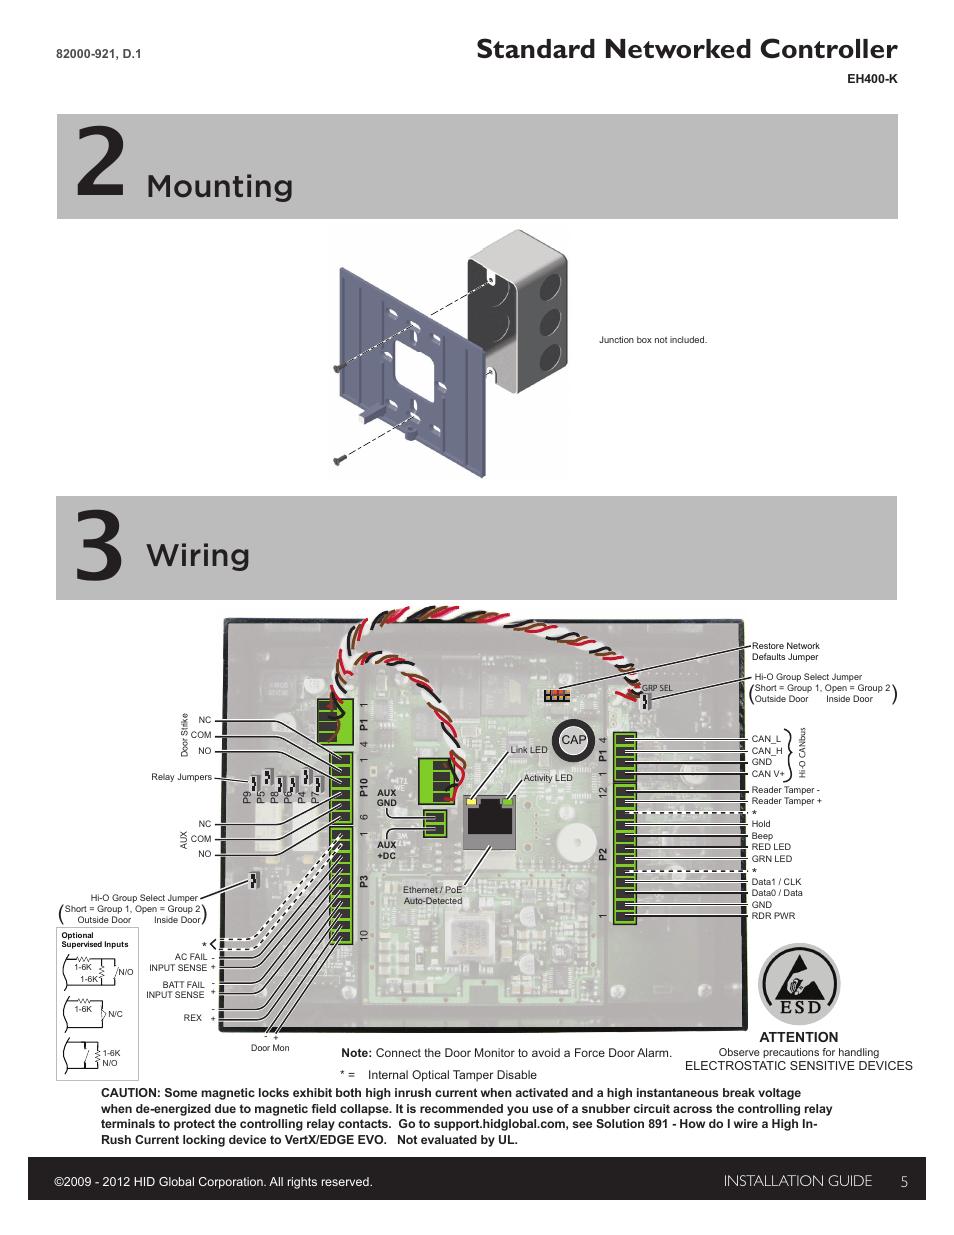 medium resolution of 2 mounting 3 wiring mounting hid edge evo solo esh400 k2 mounting 3